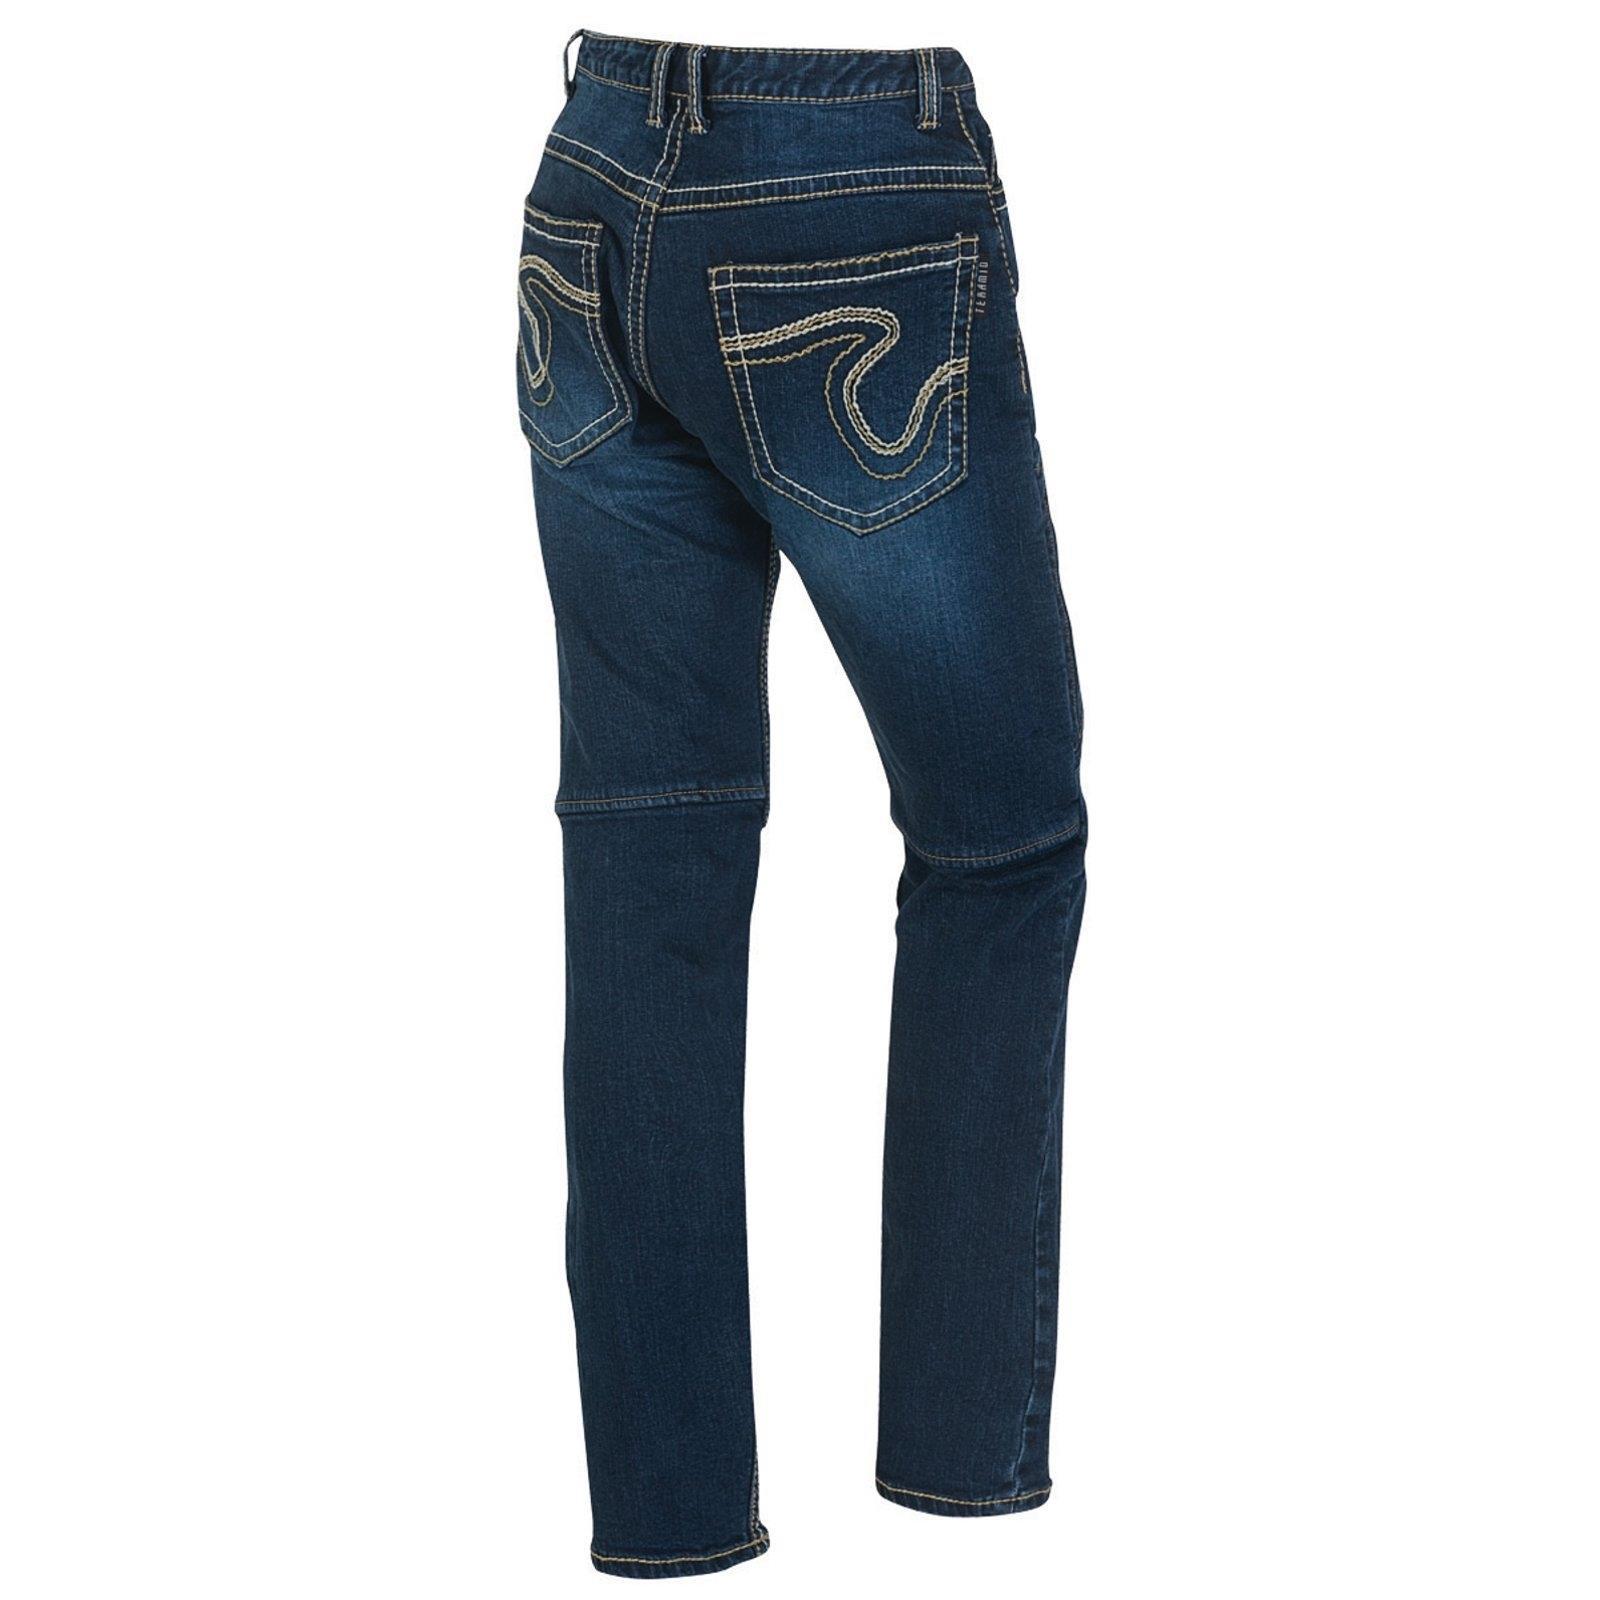 germot jason motorrad jeans herren blau l32 style. Black Bedroom Furniture Sets. Home Design Ideas